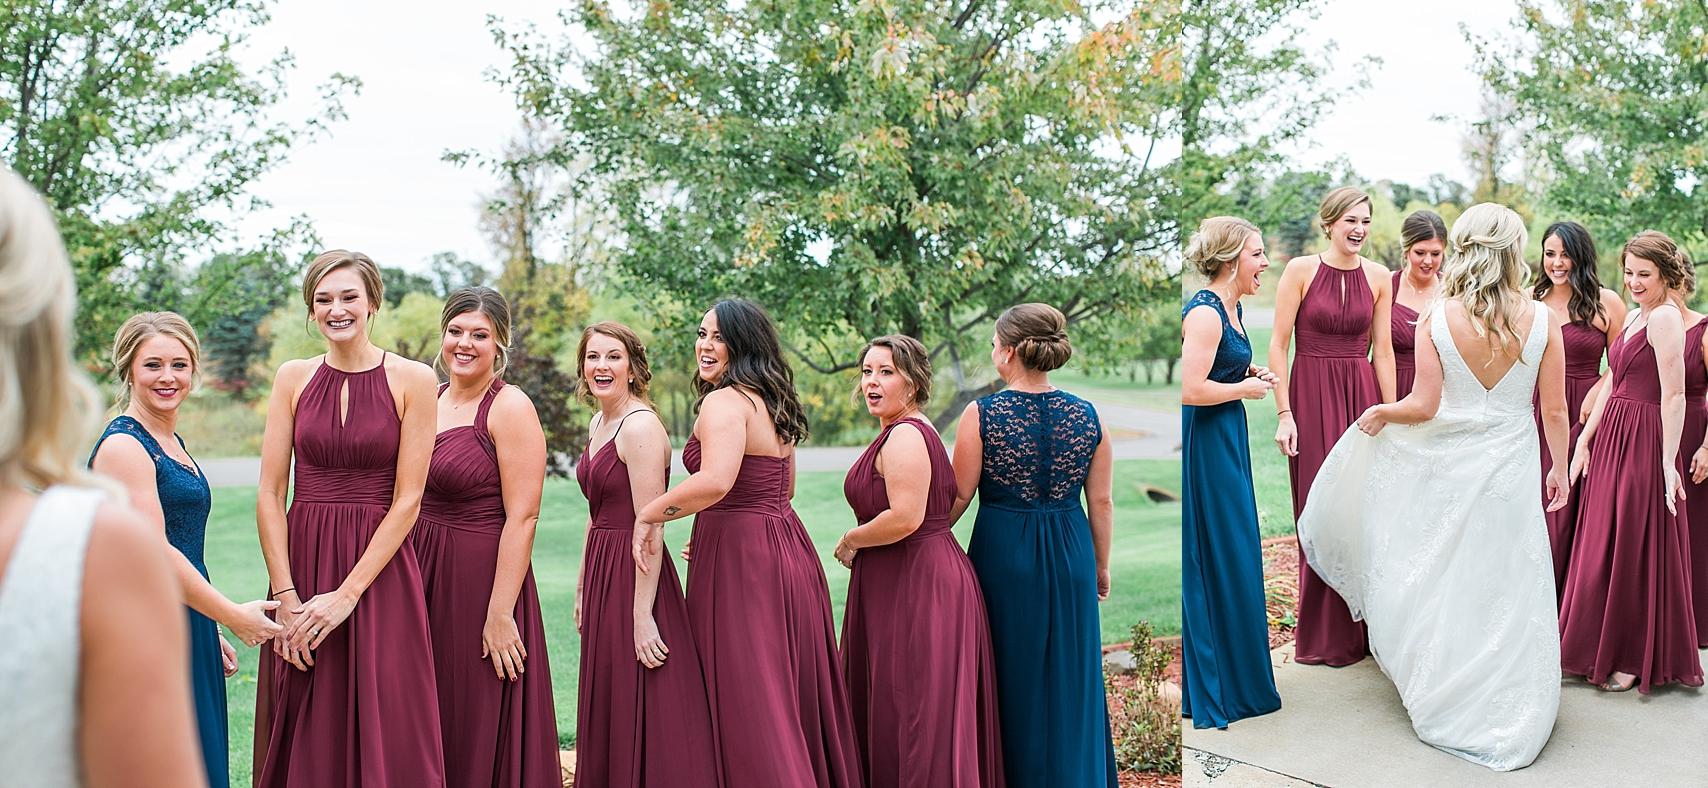 Minnesota Minneapolis Wedding Photographer Best Of 2018 Weddings Mallory Kiesow Photography_0162.jpg